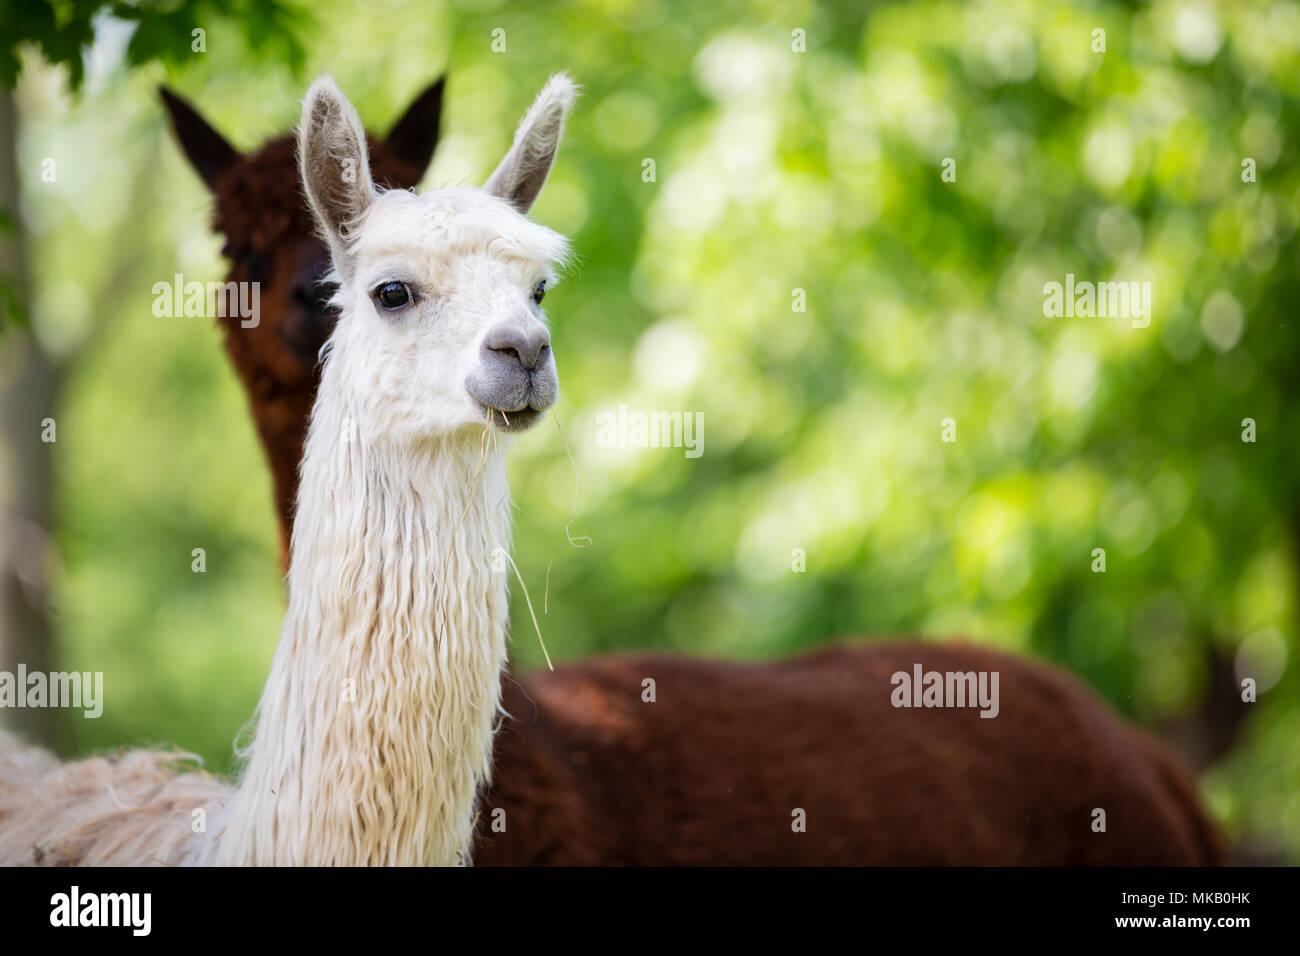 Portrait of white Alpaca, a South American mammal - Stock Image